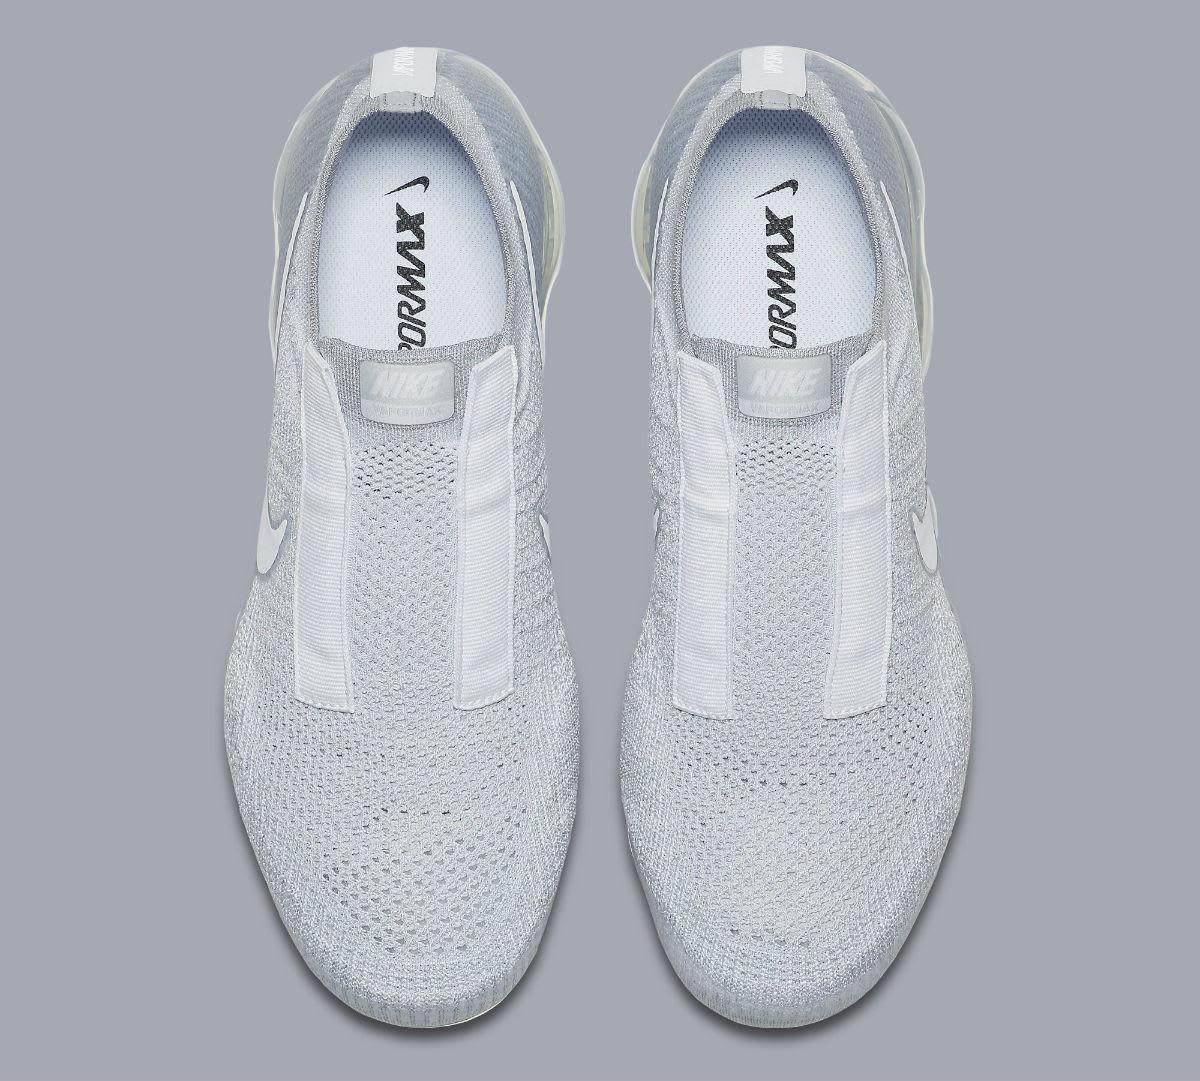 Nike Air VaporMax Laceless Pure Platinum Release Date Top AQ0581-002